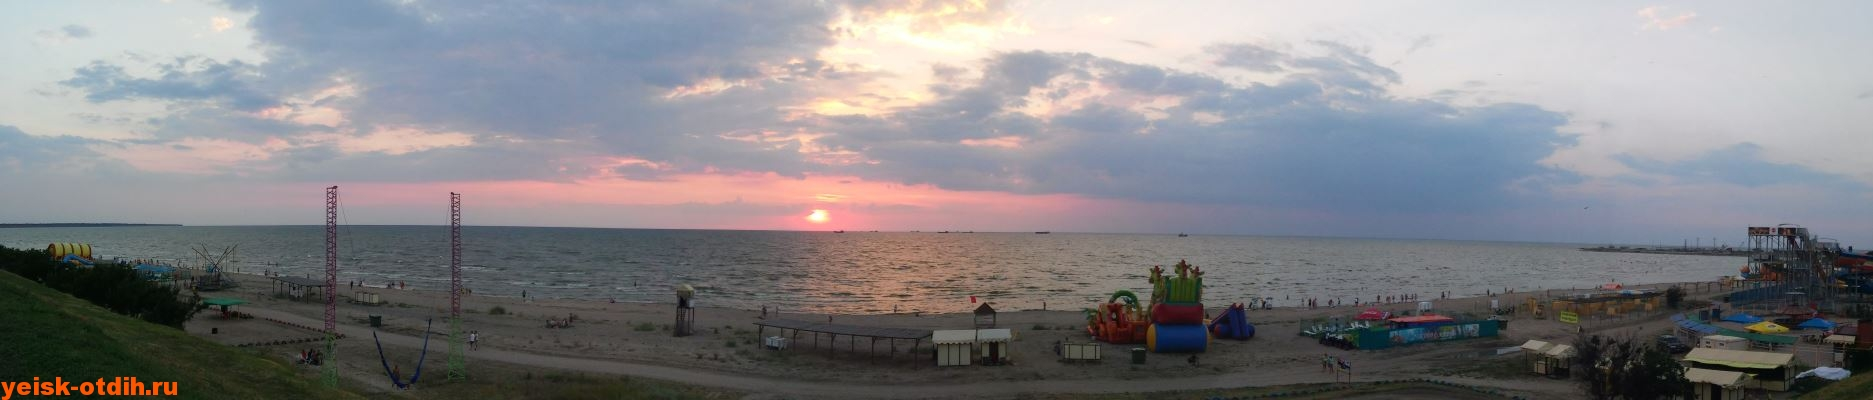 Широкоформатное фото пляж Каменка Ейск вечер Закат